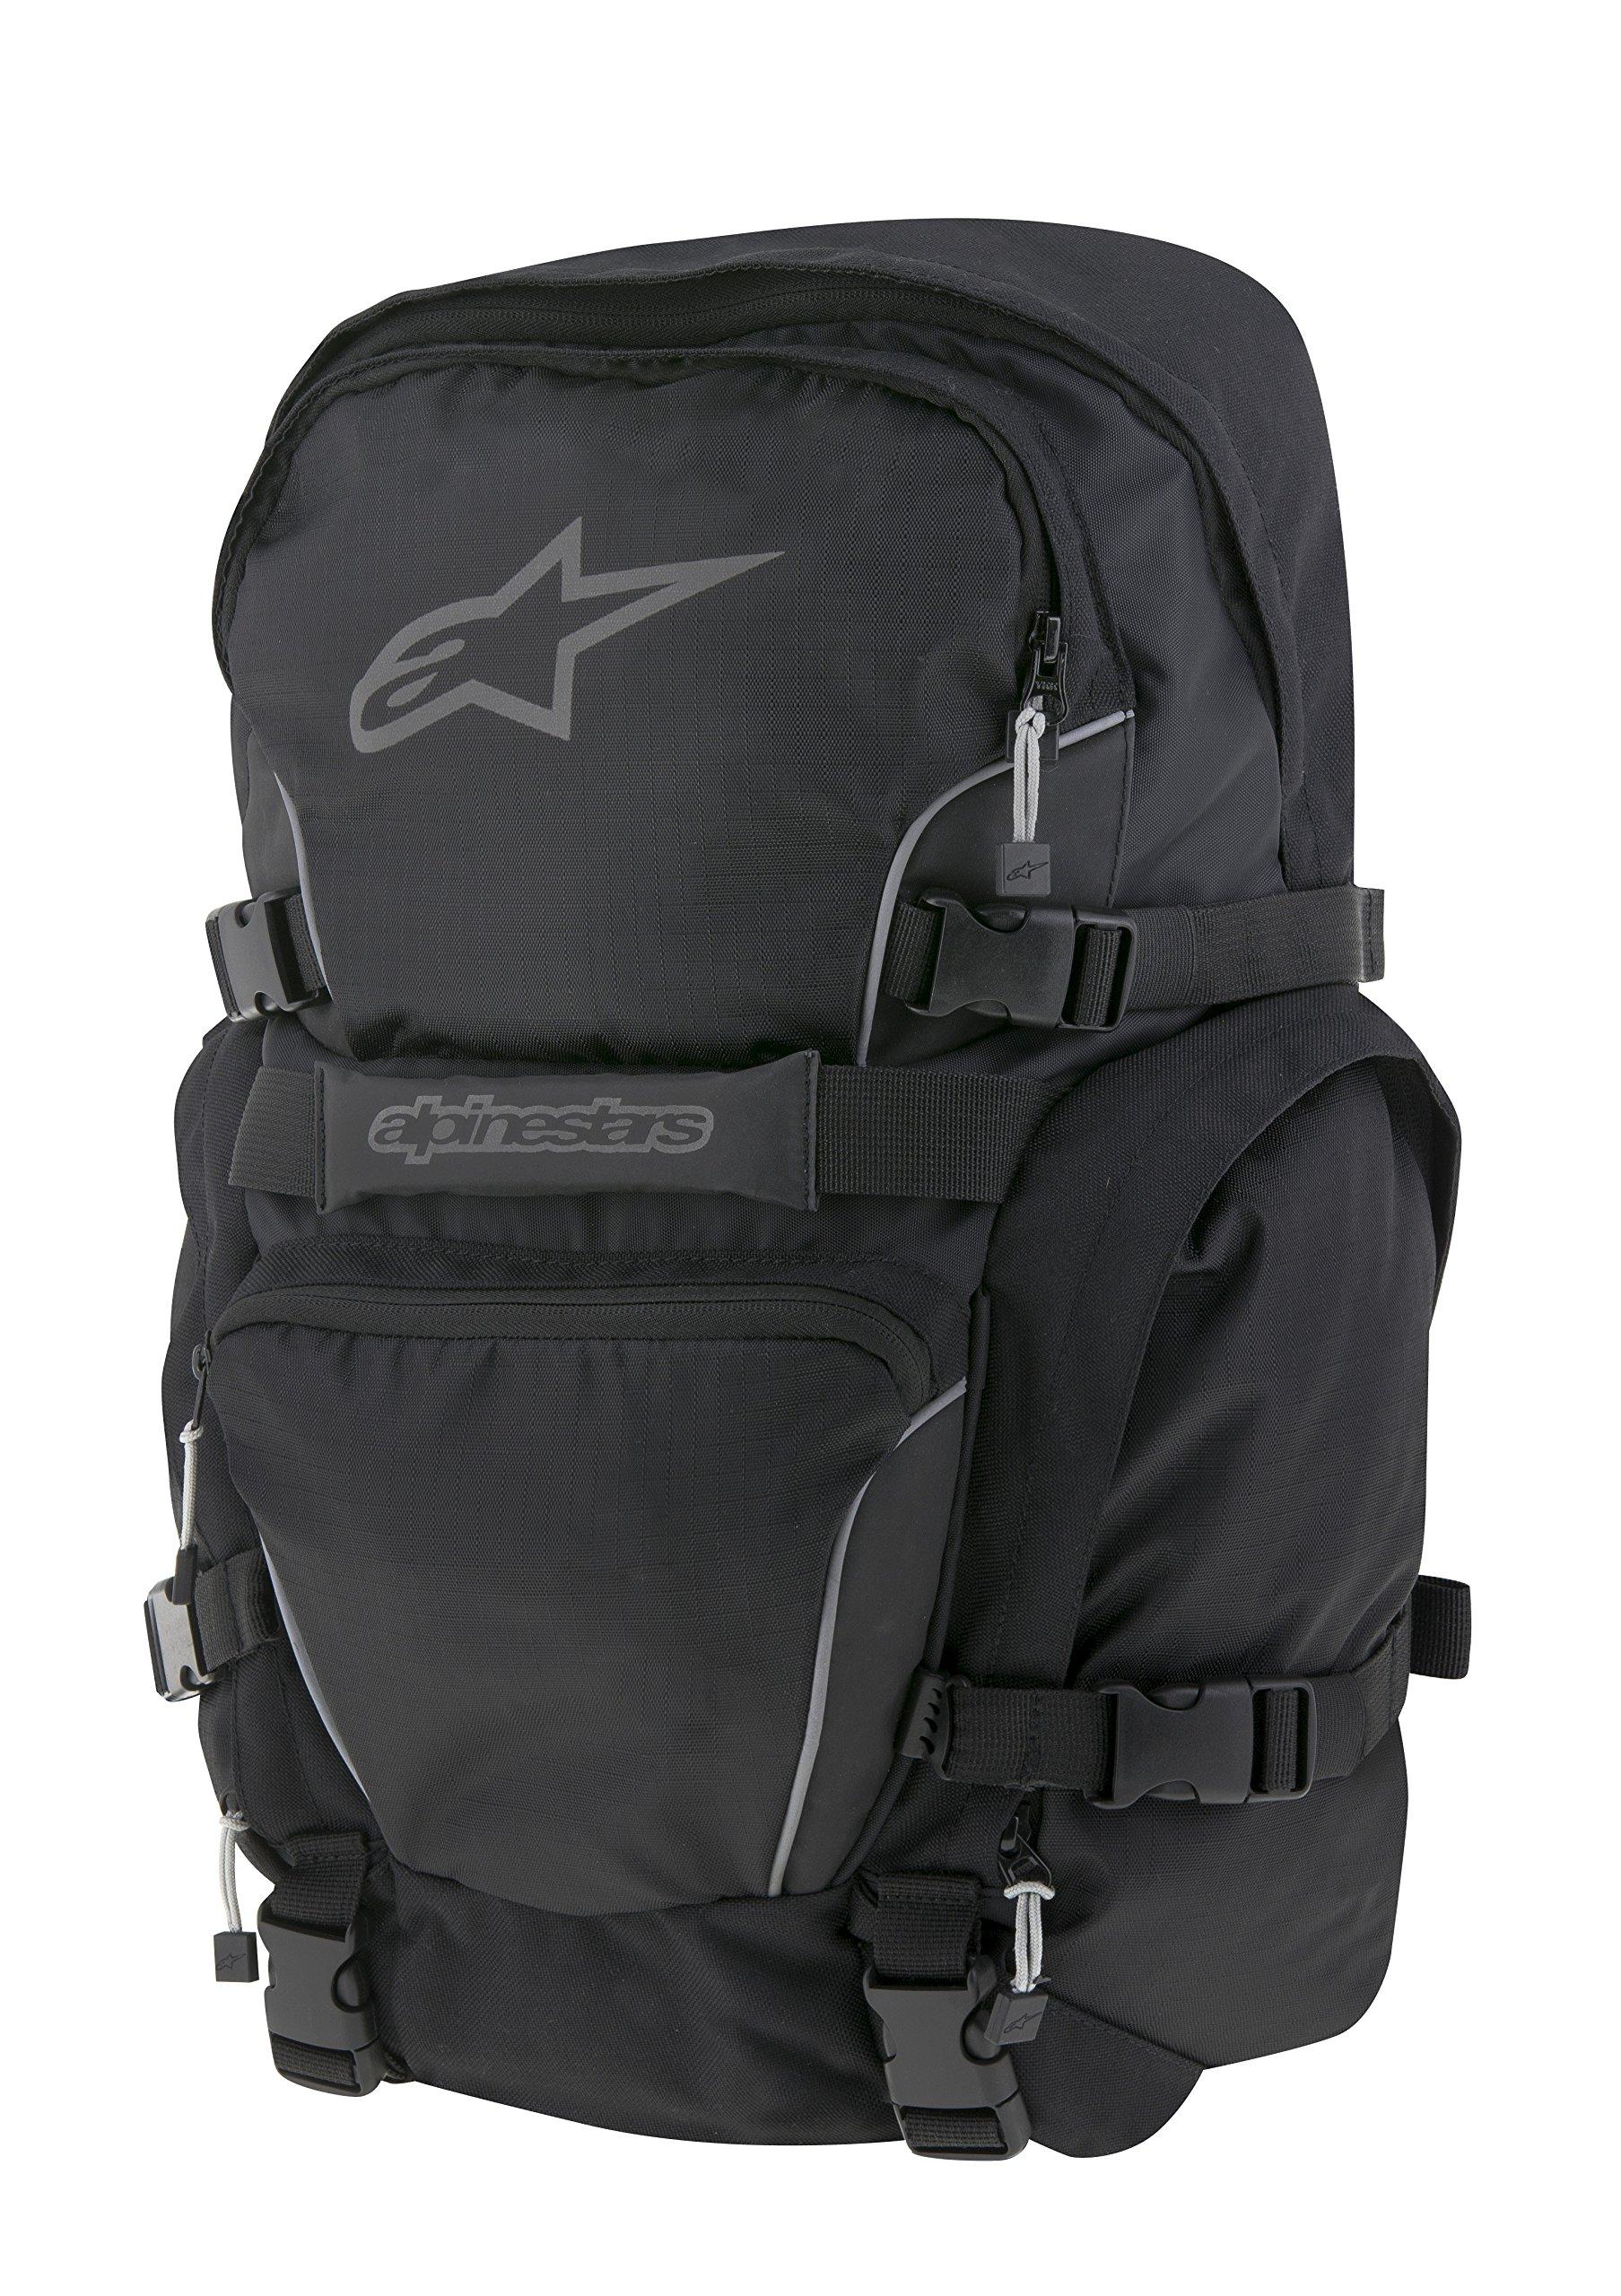 Alpinestars Force 2016 Gear Backpack Black/Gray/Silver